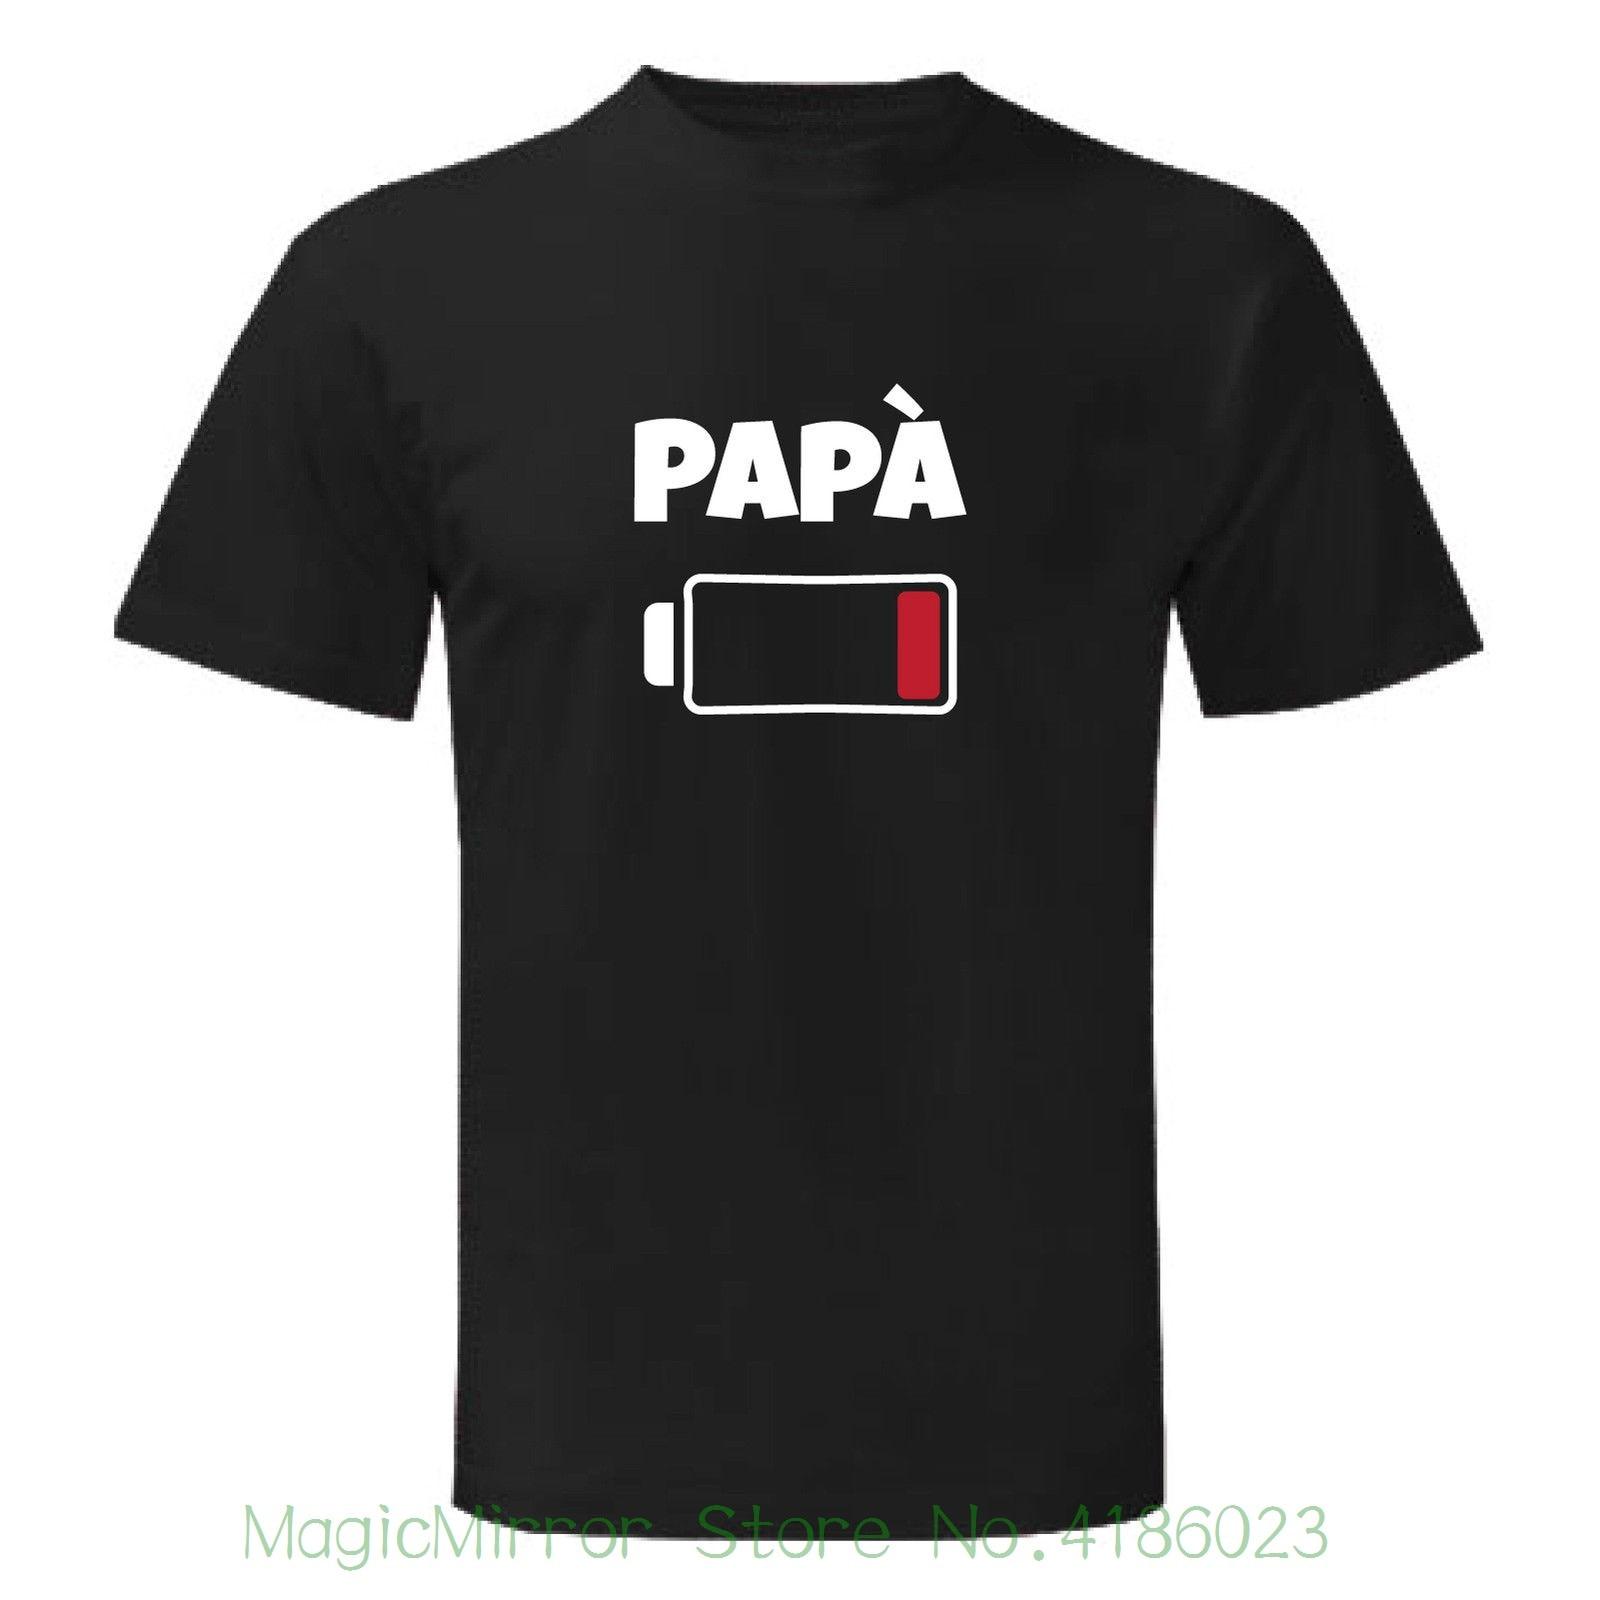 Art T-shirt , Maglietta Famiglia Pap. Batteria , Uomo Man , Nero Round Collar Short Sleeve Tee Shirts